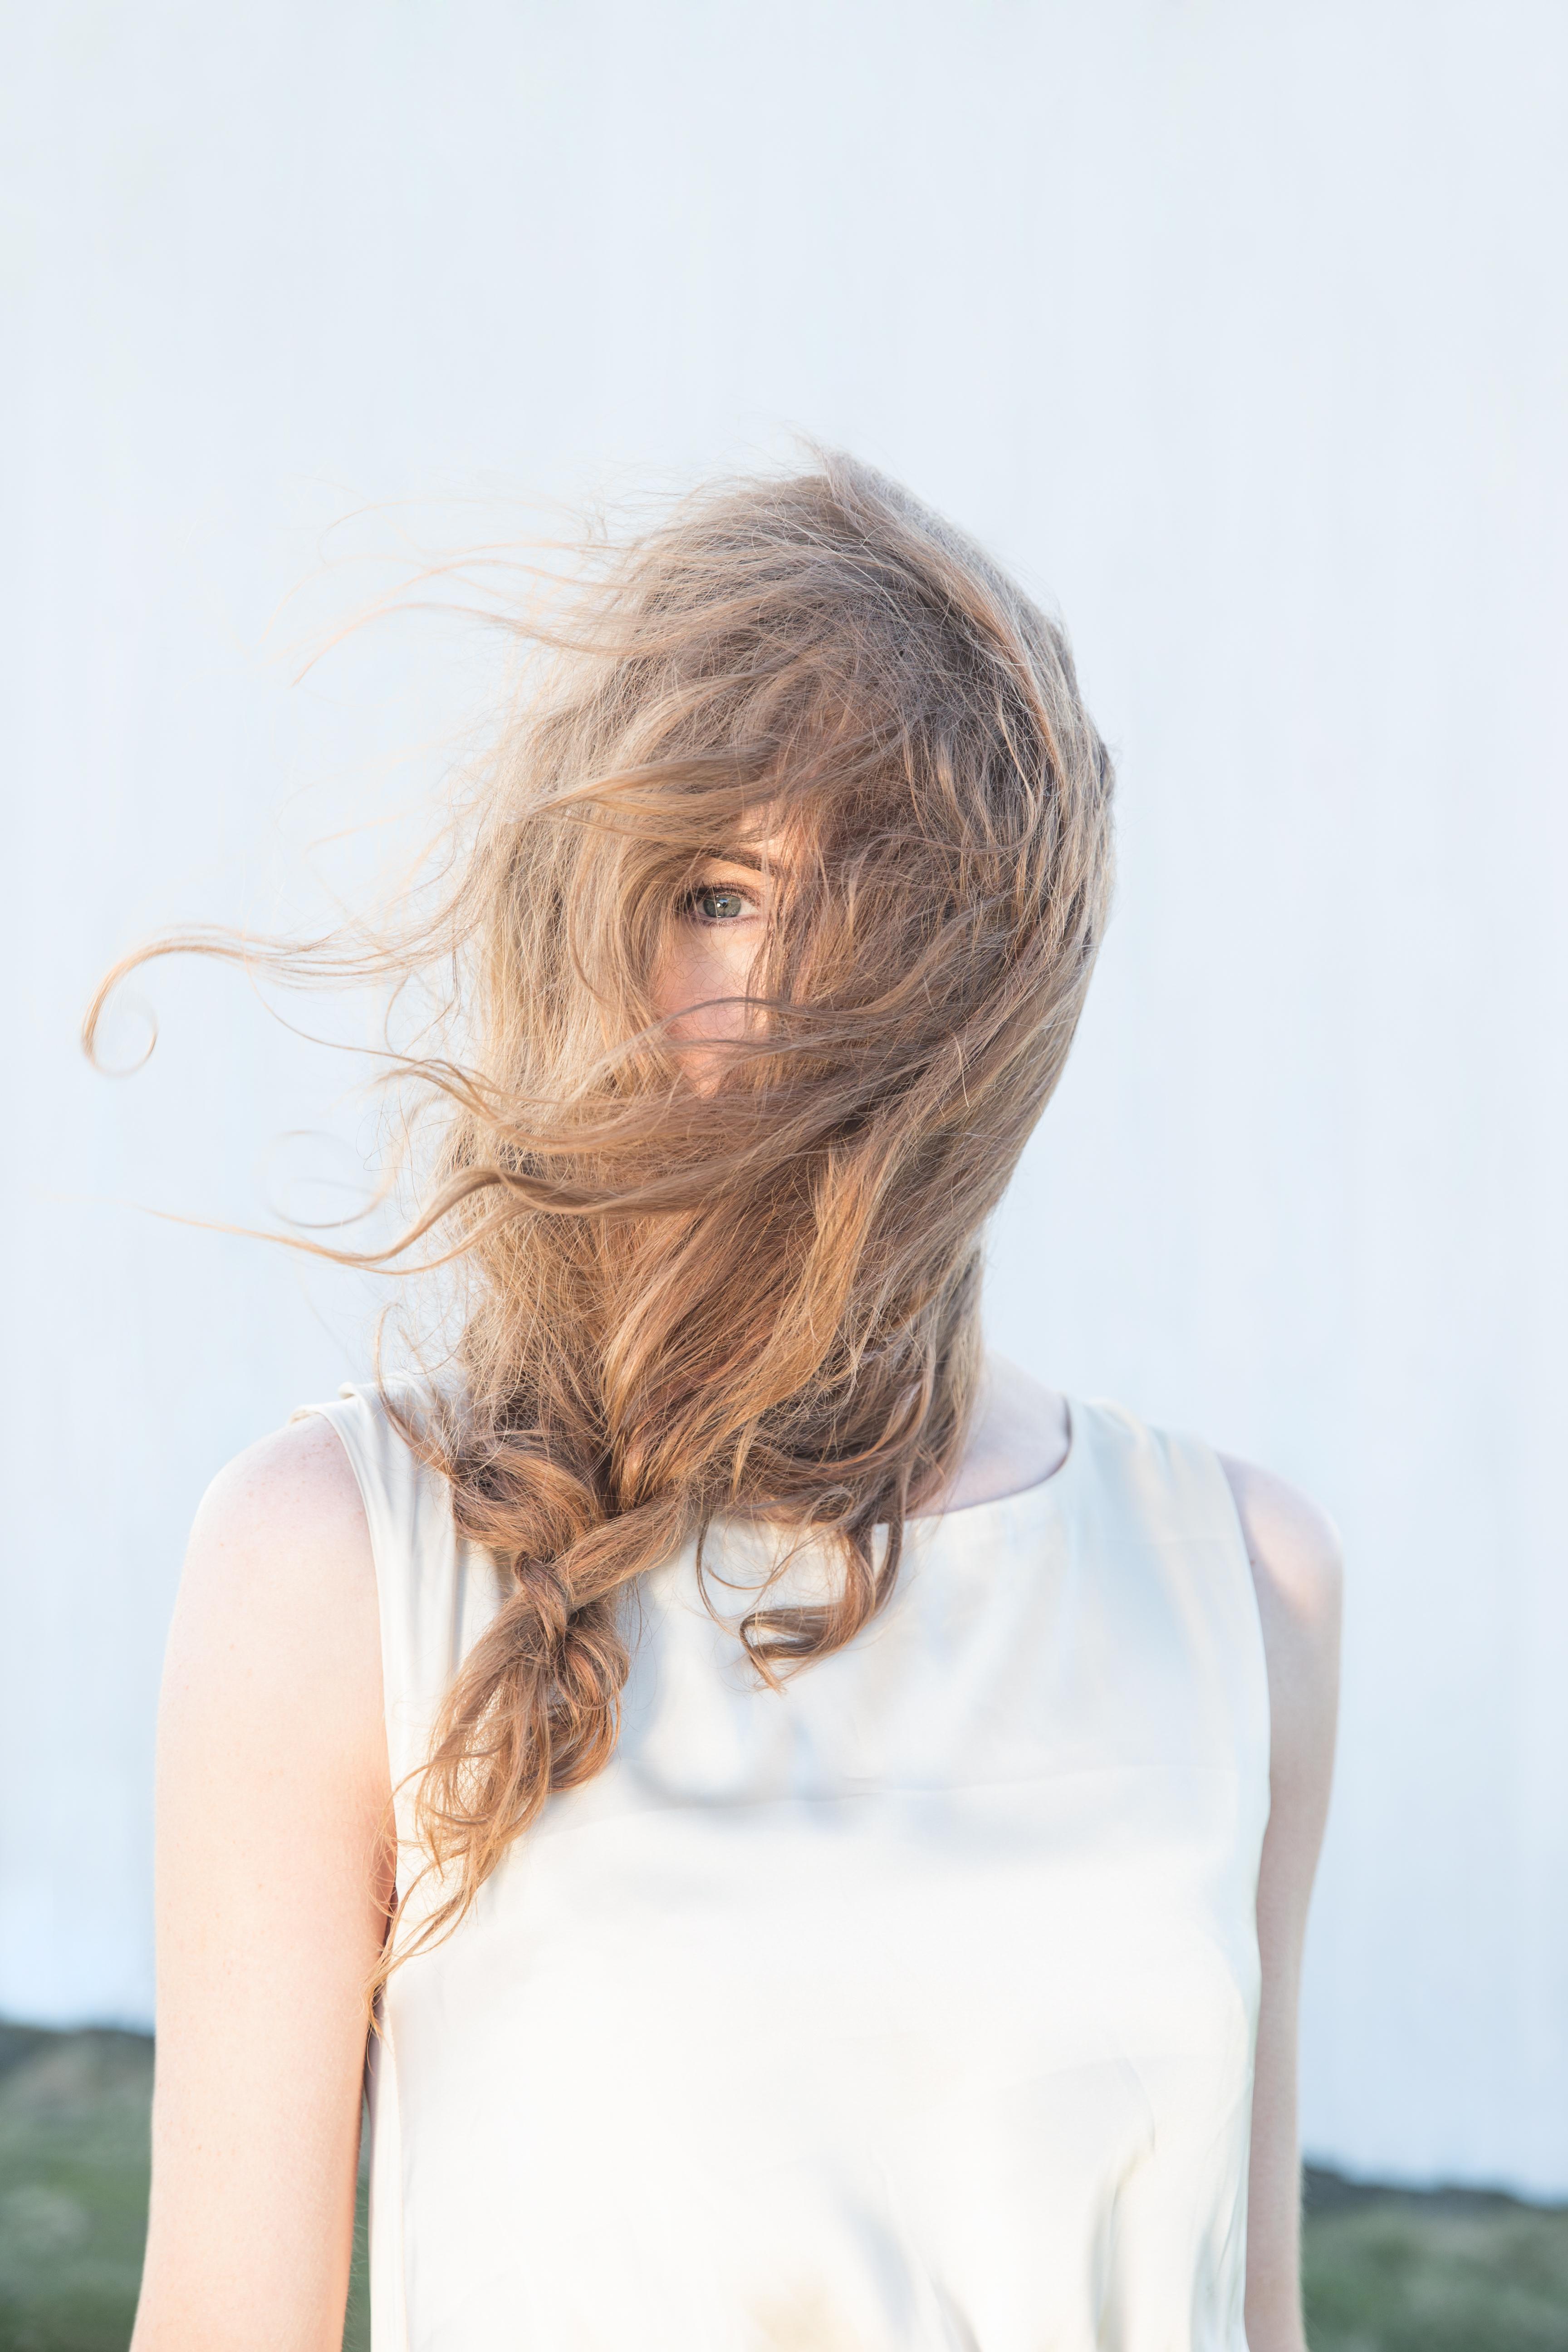 Årets_hårstylist_bilde_3